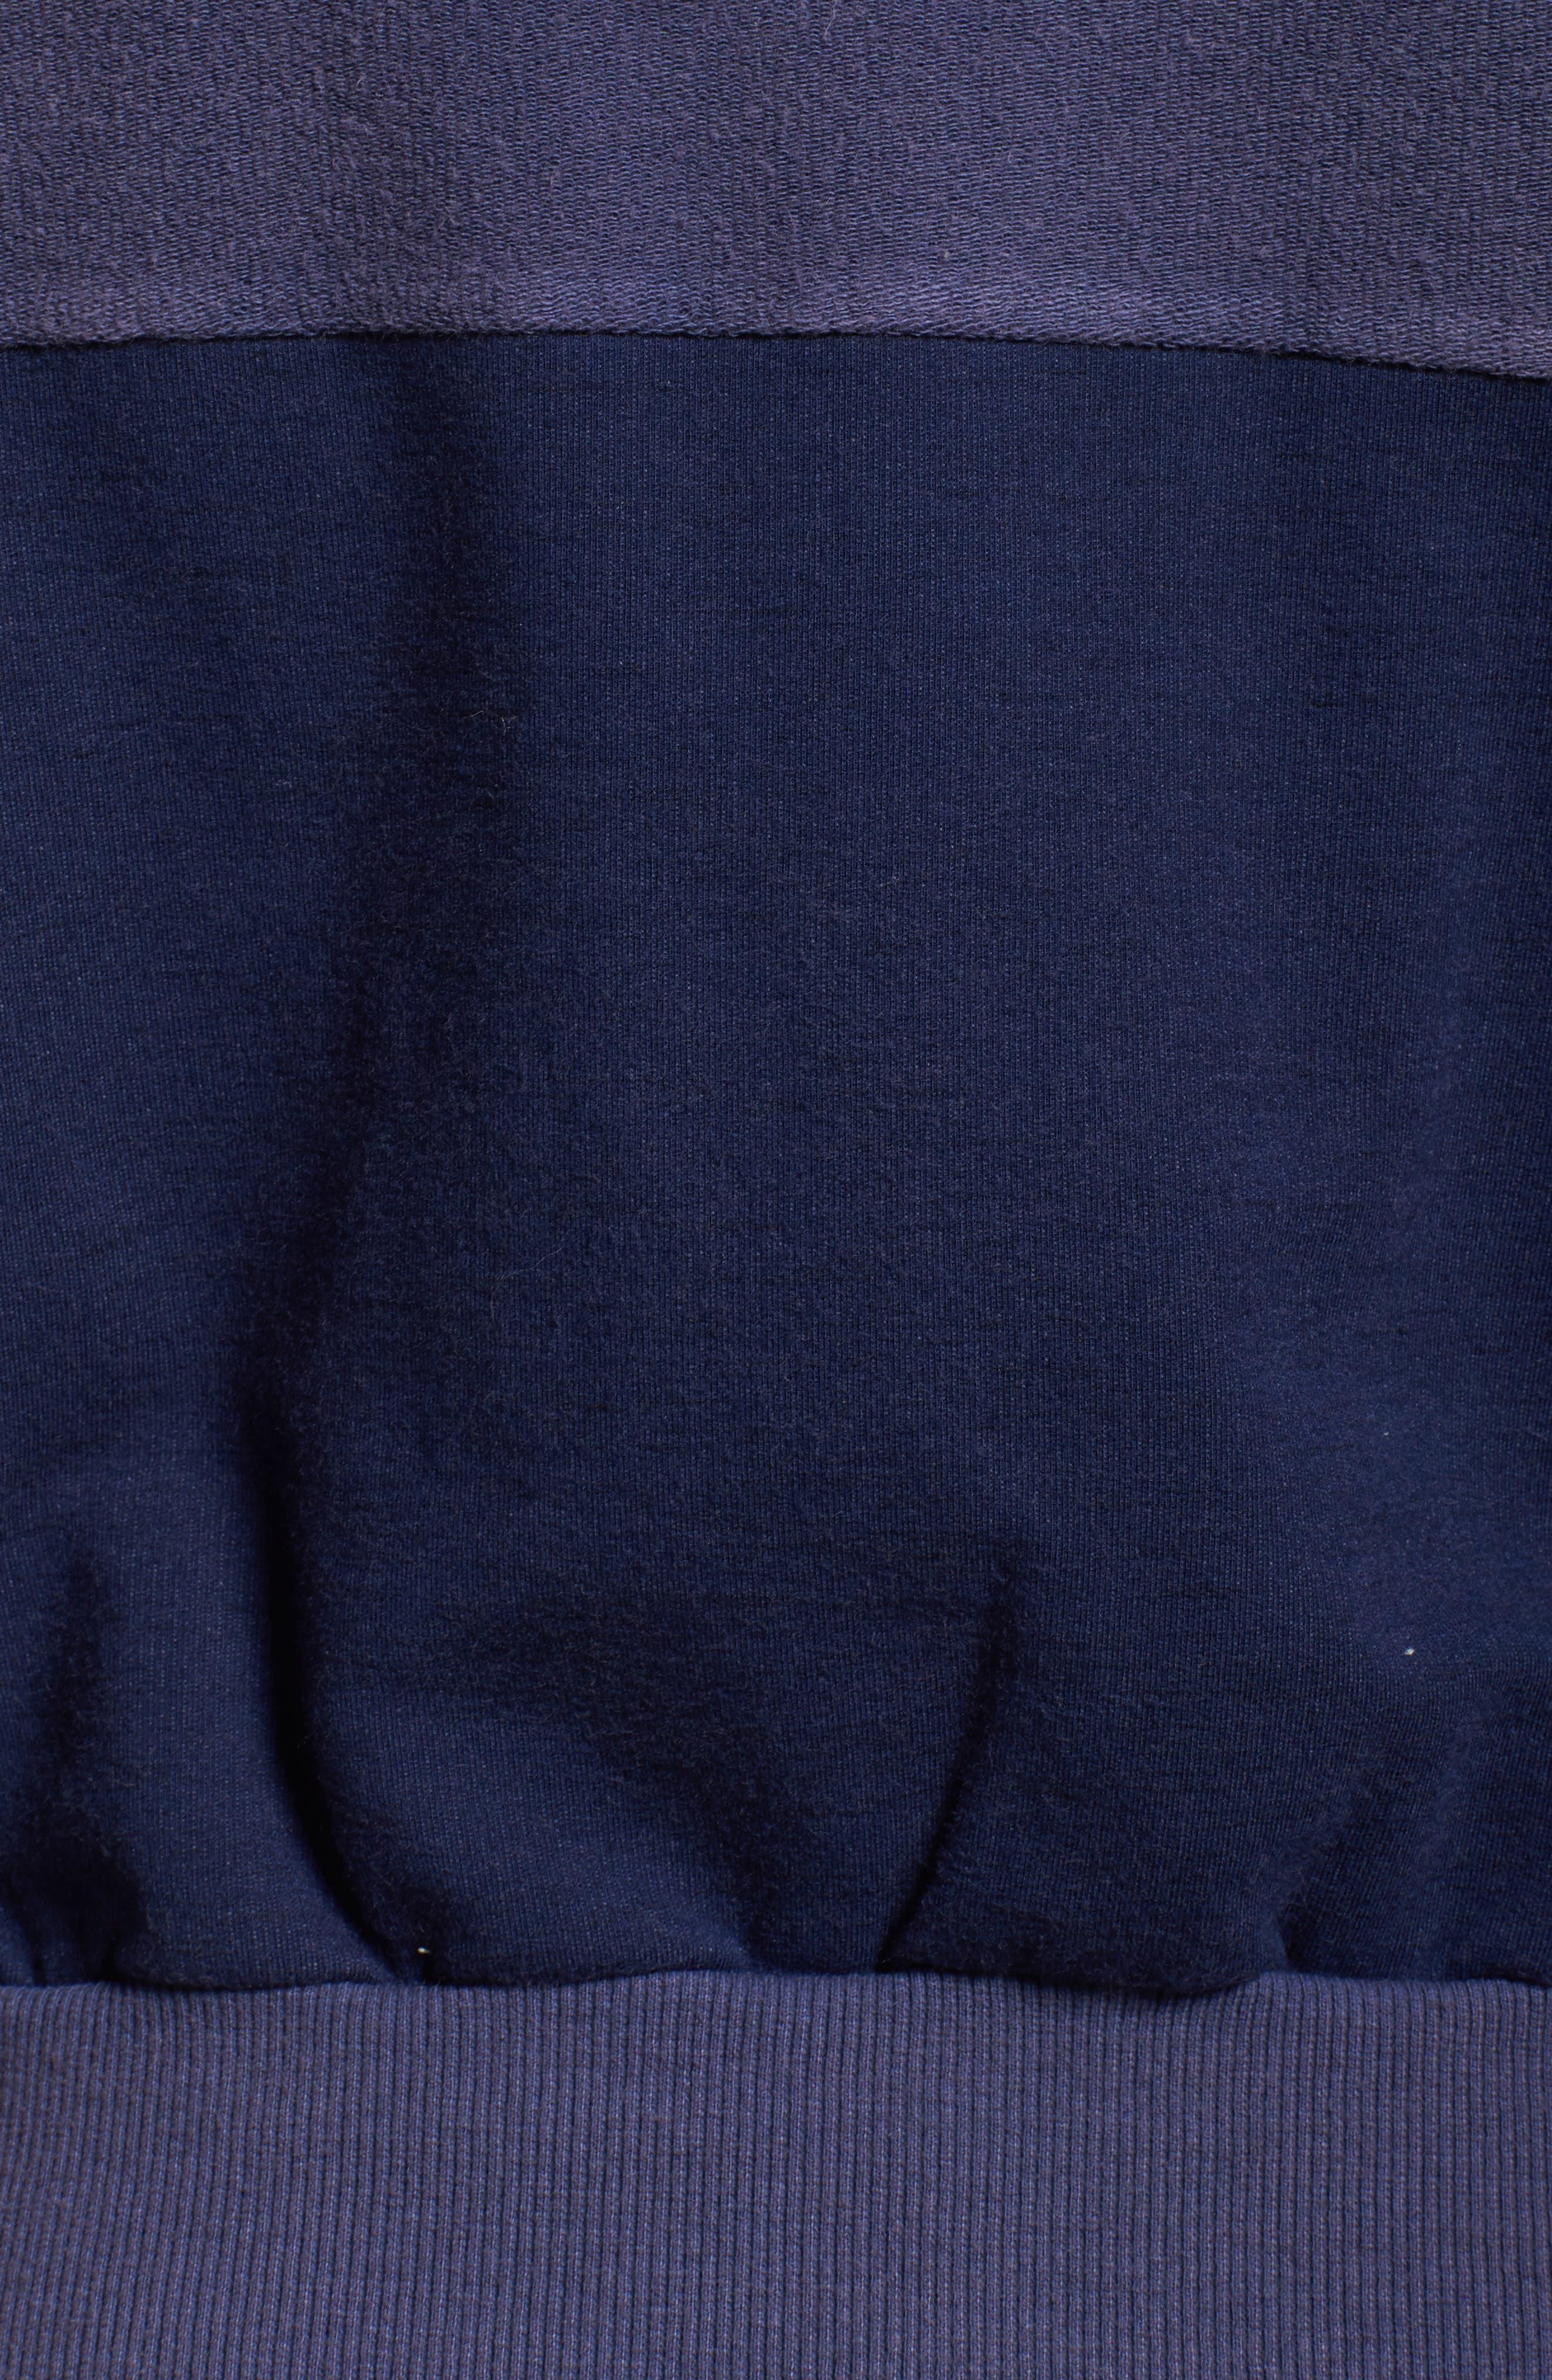 FP Movement Shadowboxer Hoodie,                             Alternate thumbnail 7, color,                             Blue